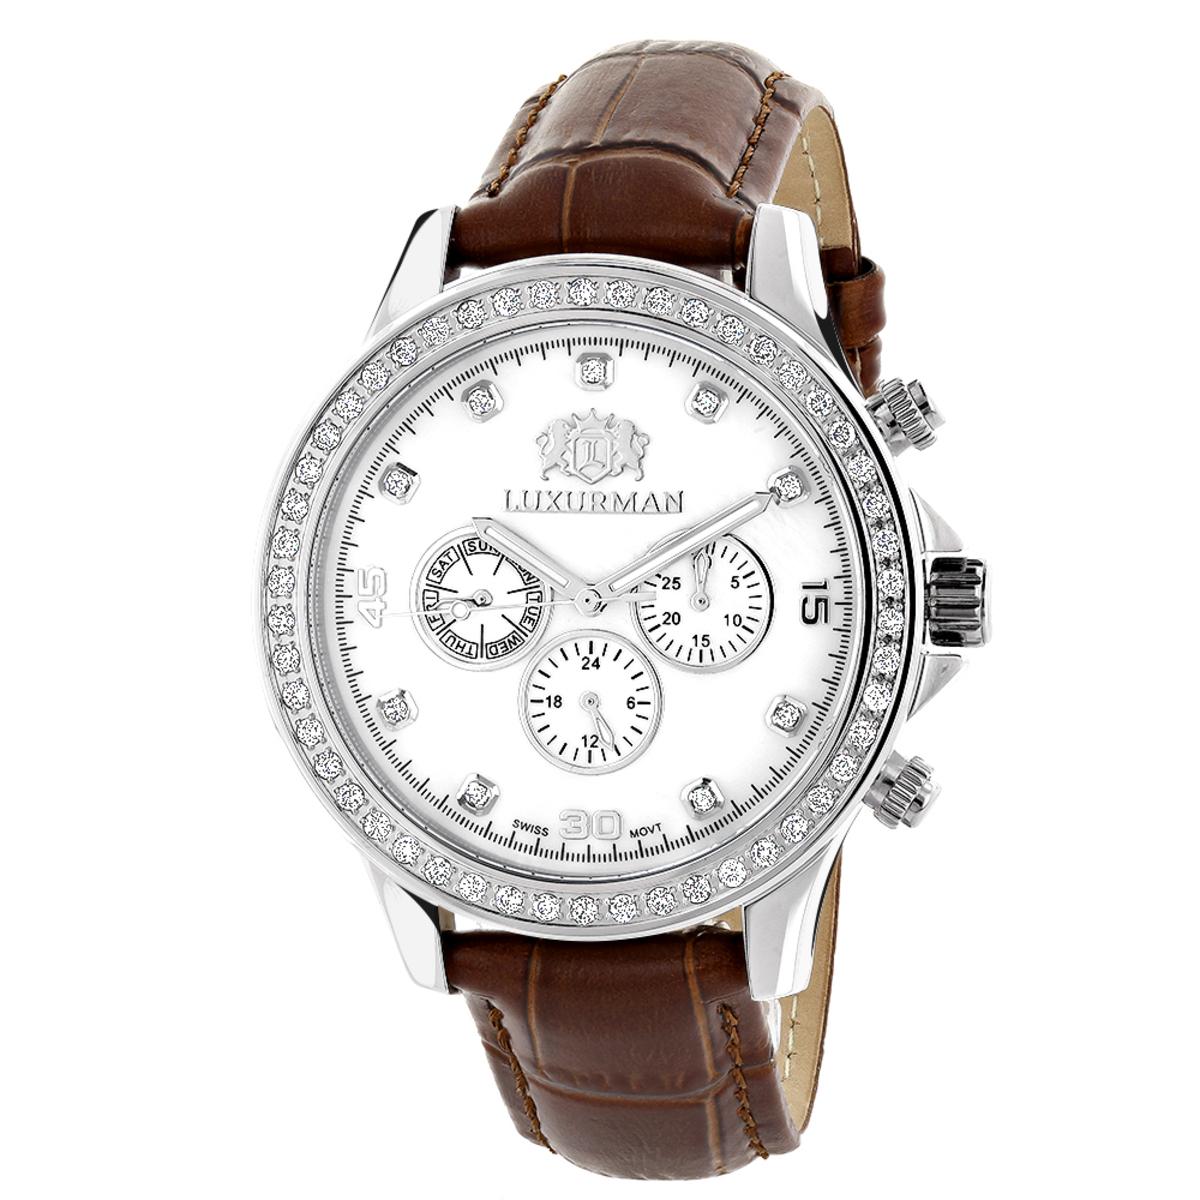 Diamond Watches For Men: Luxurman Liberty Diamond Bezel Watch White MOP 2ct